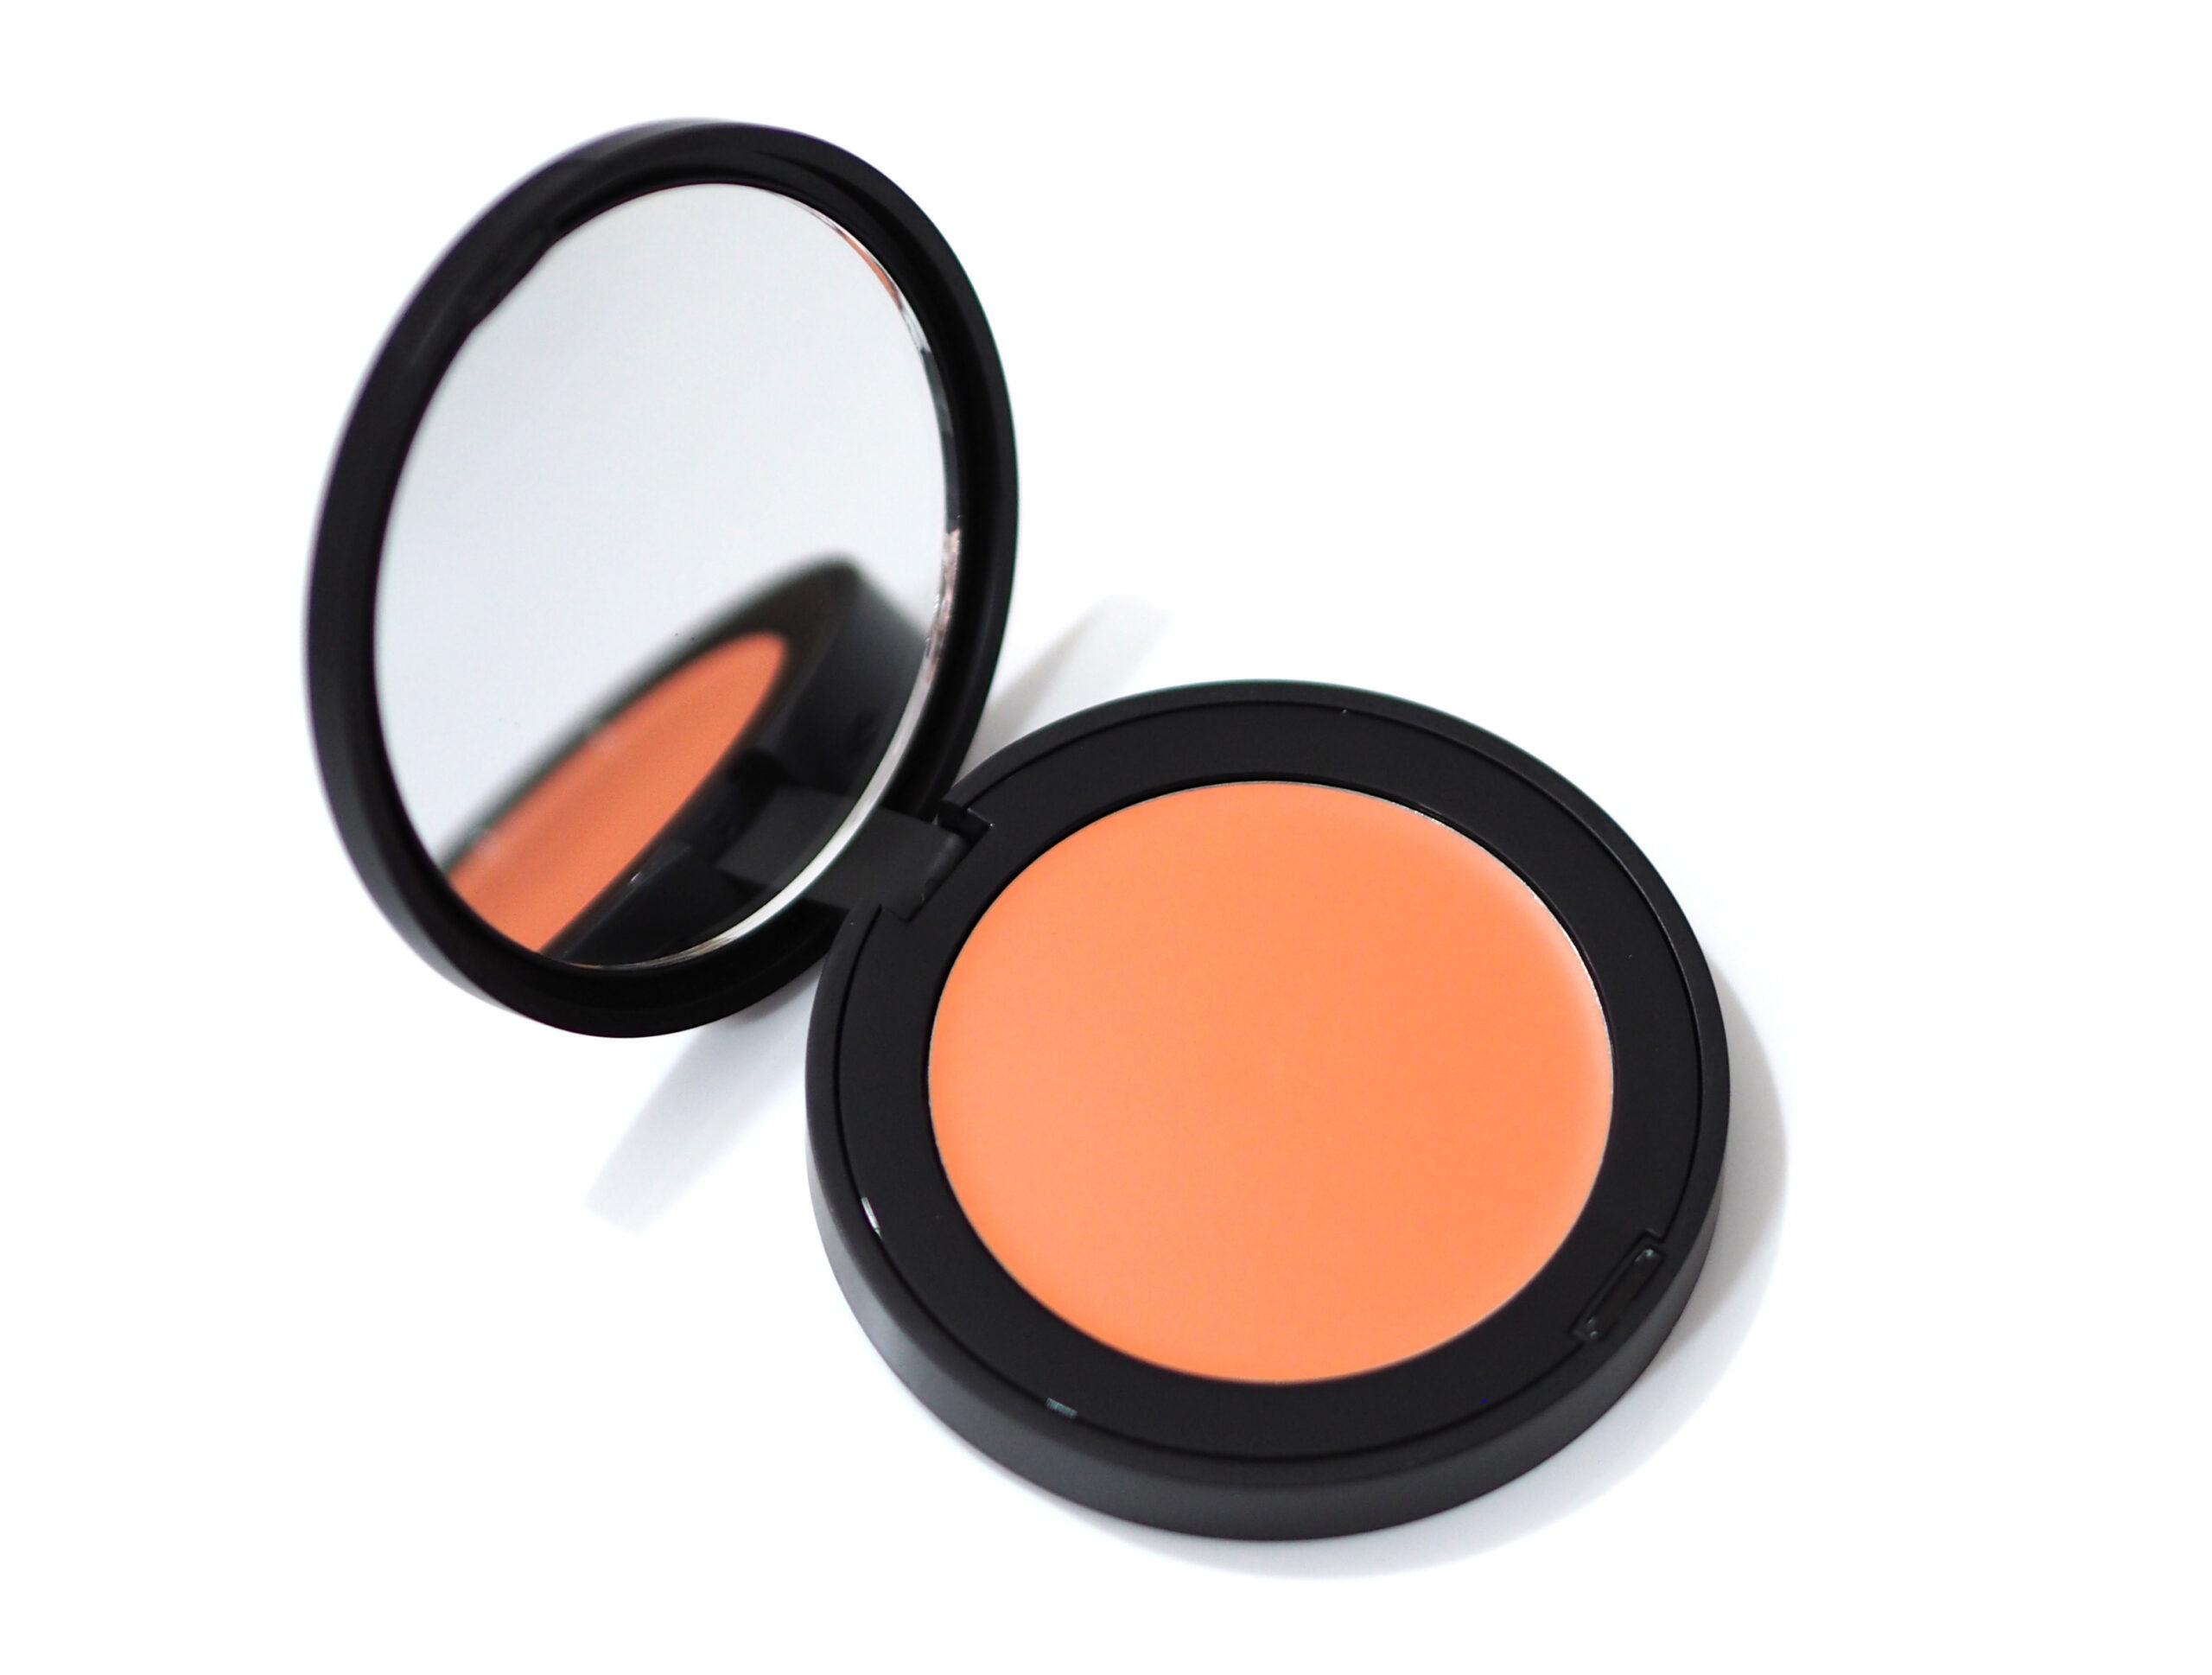 Melt Cosmetics Cali Dream Cream Blushlight Review / Swatches